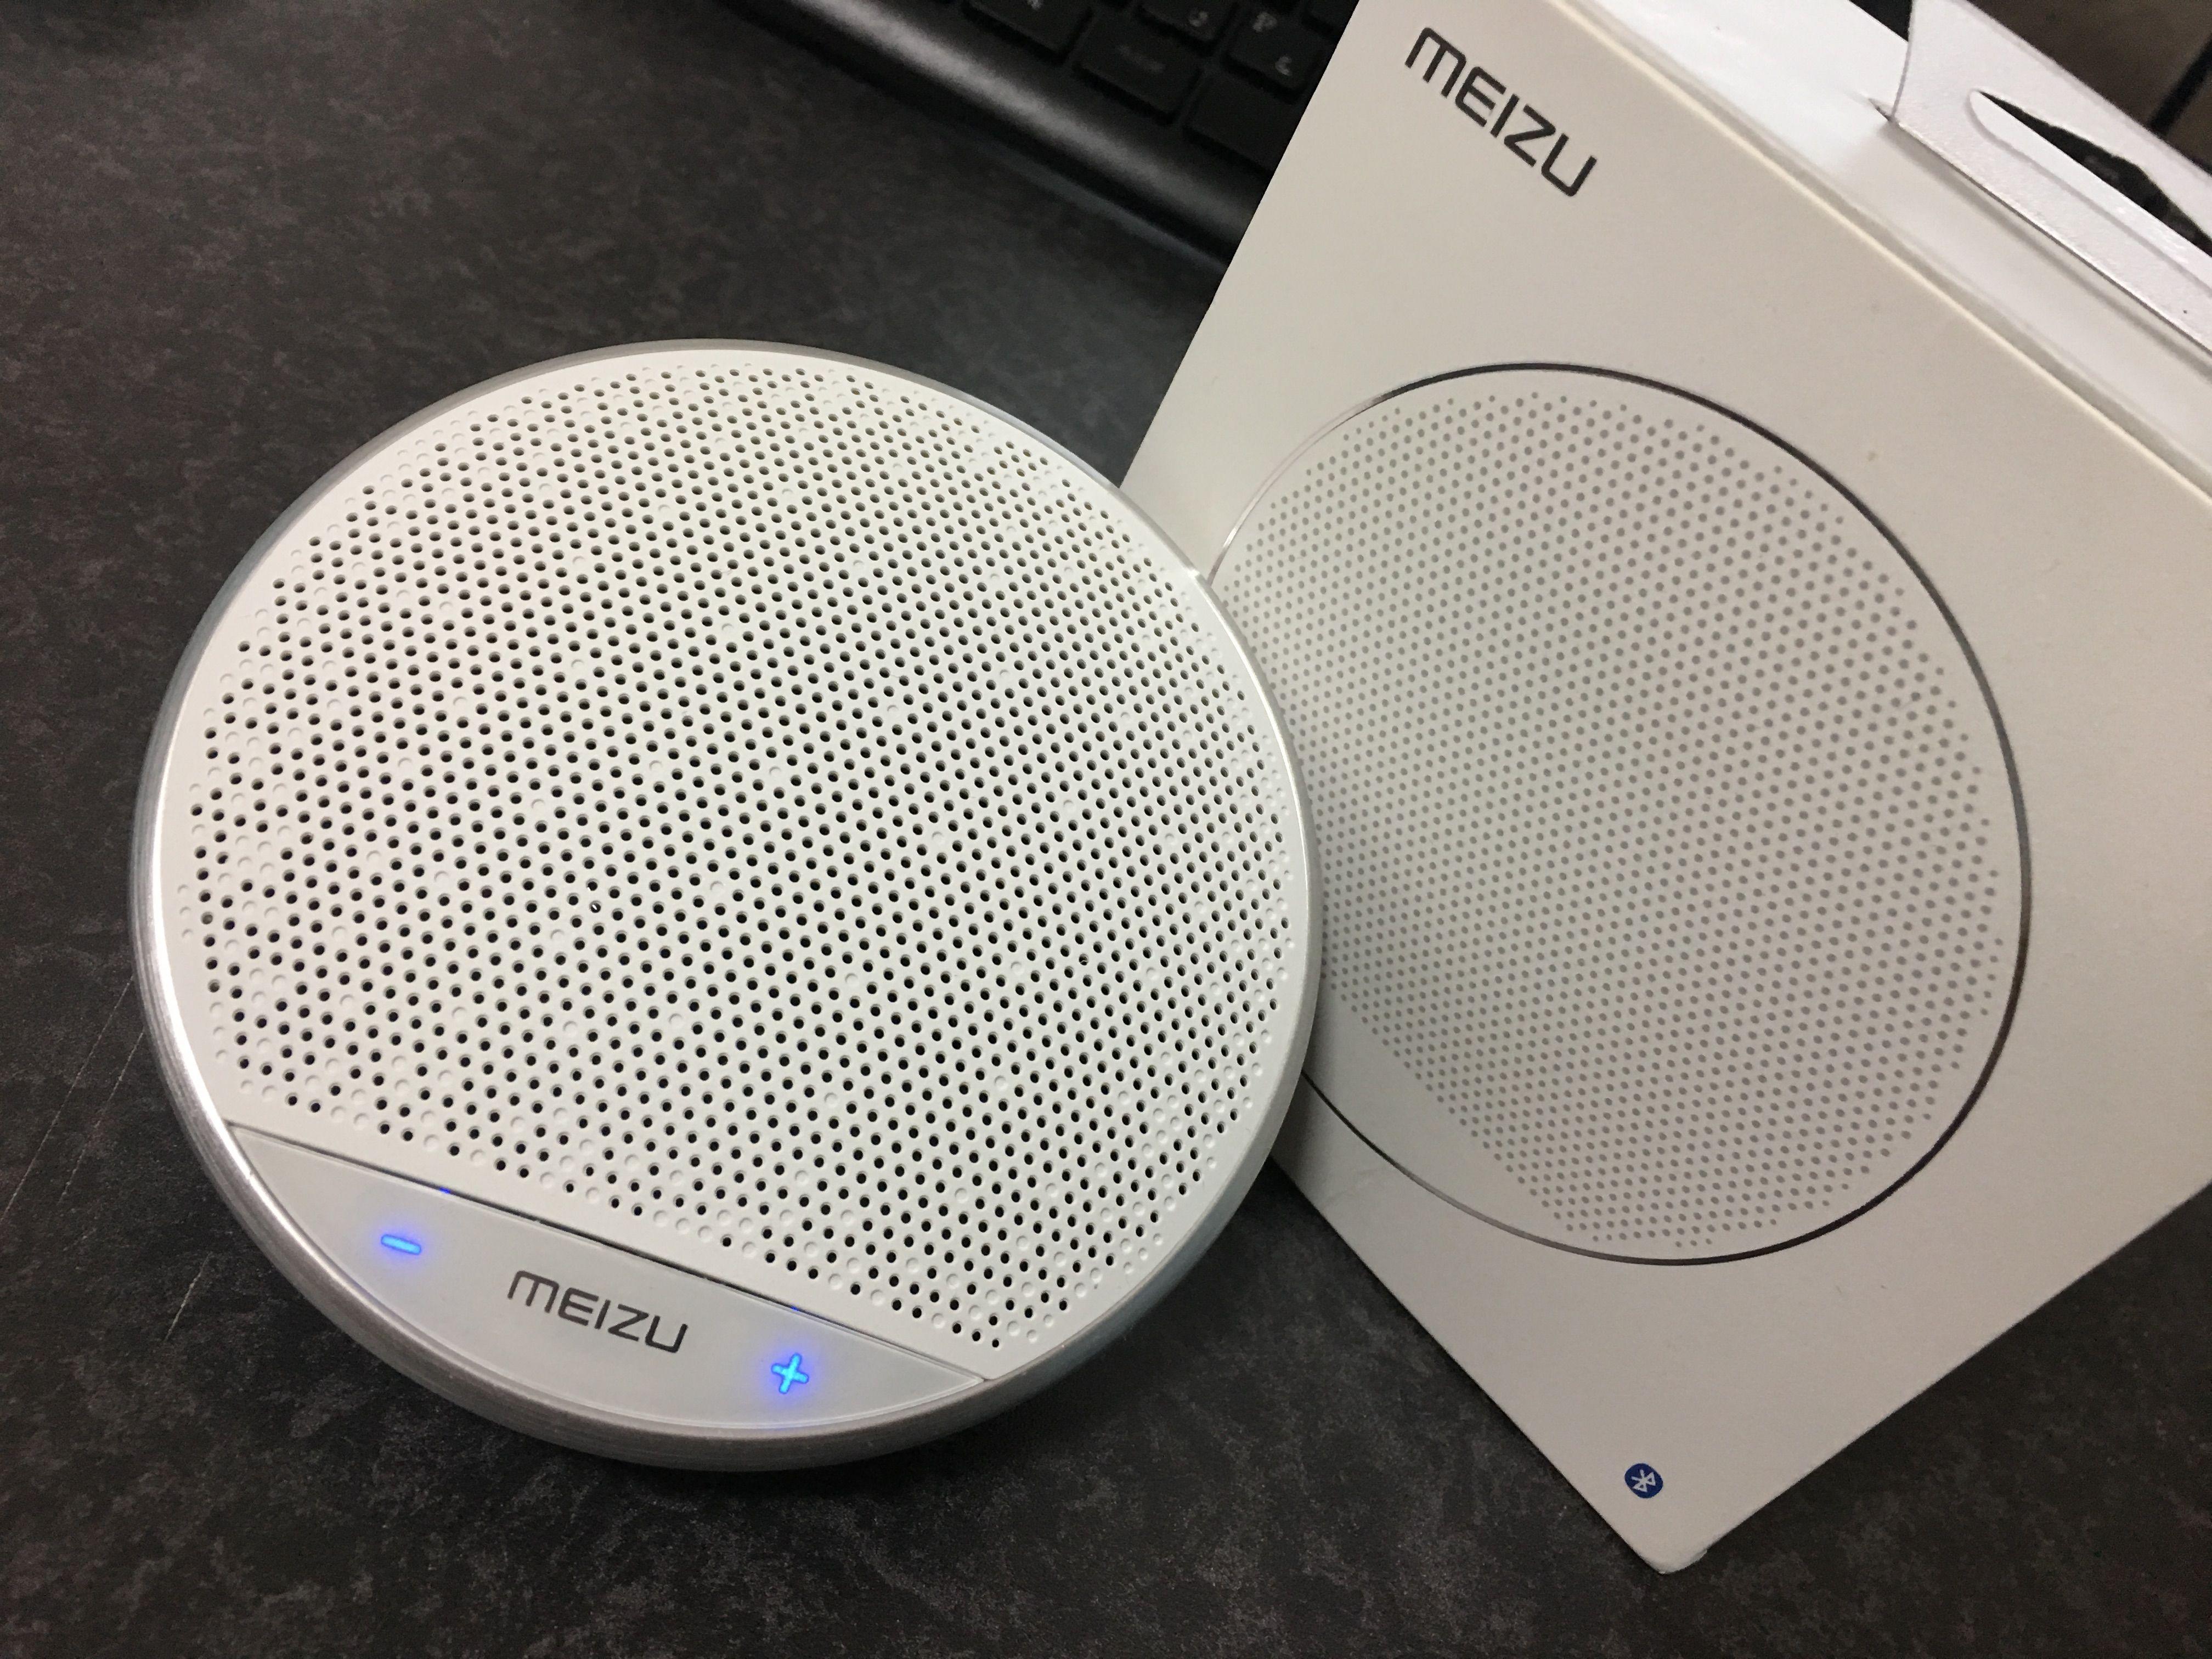 MEIZU Bluetooth Portable Speaker A20のレビュー!音質もよく携帯性も完璧で非常に上質な製品!